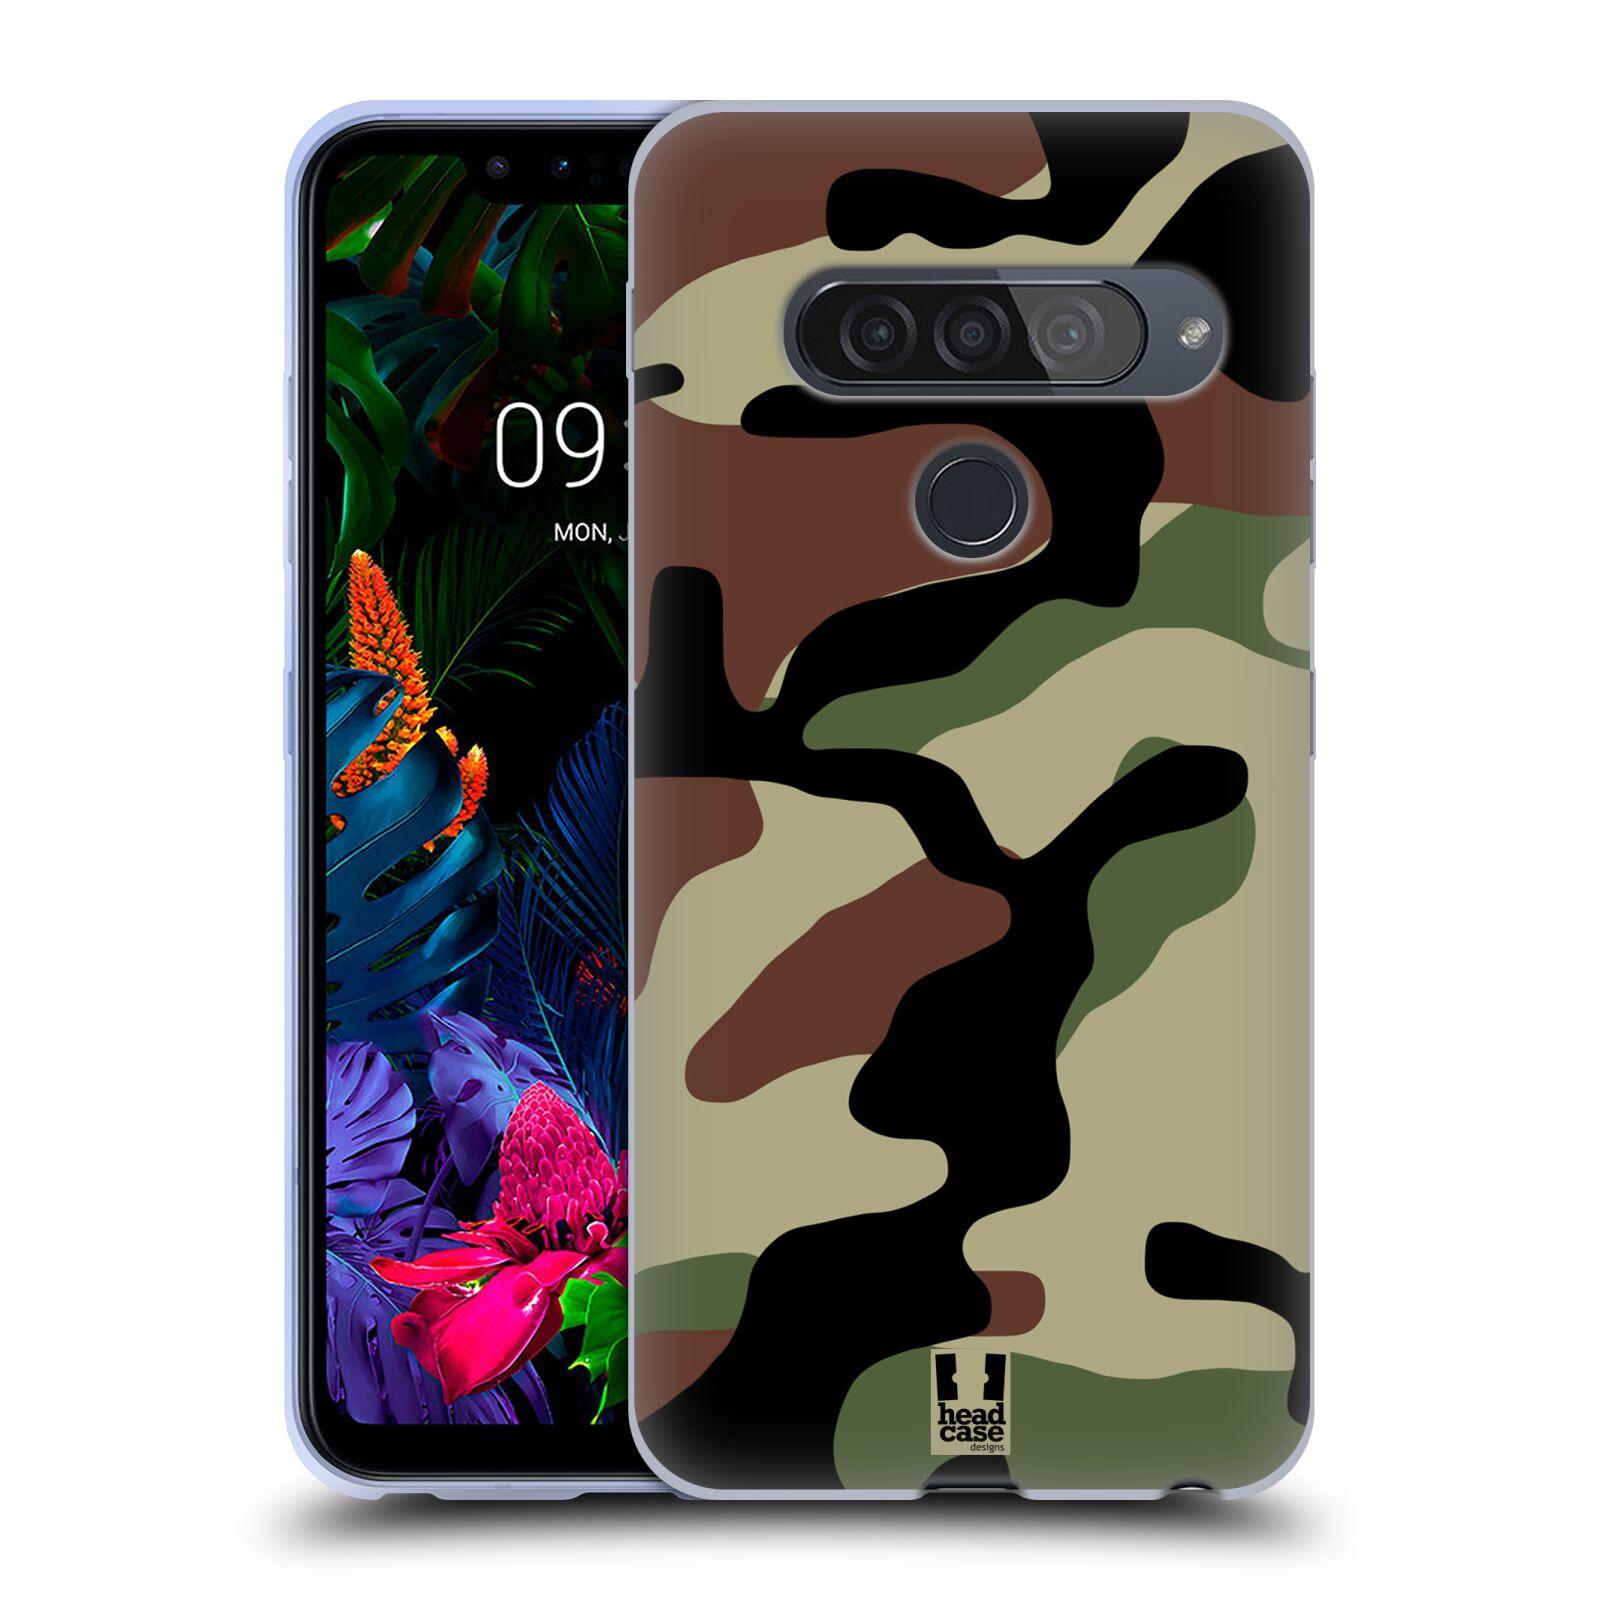 Silikonové pouzdro na mobil LG G8s ThinQ - Head Case - Maskáče